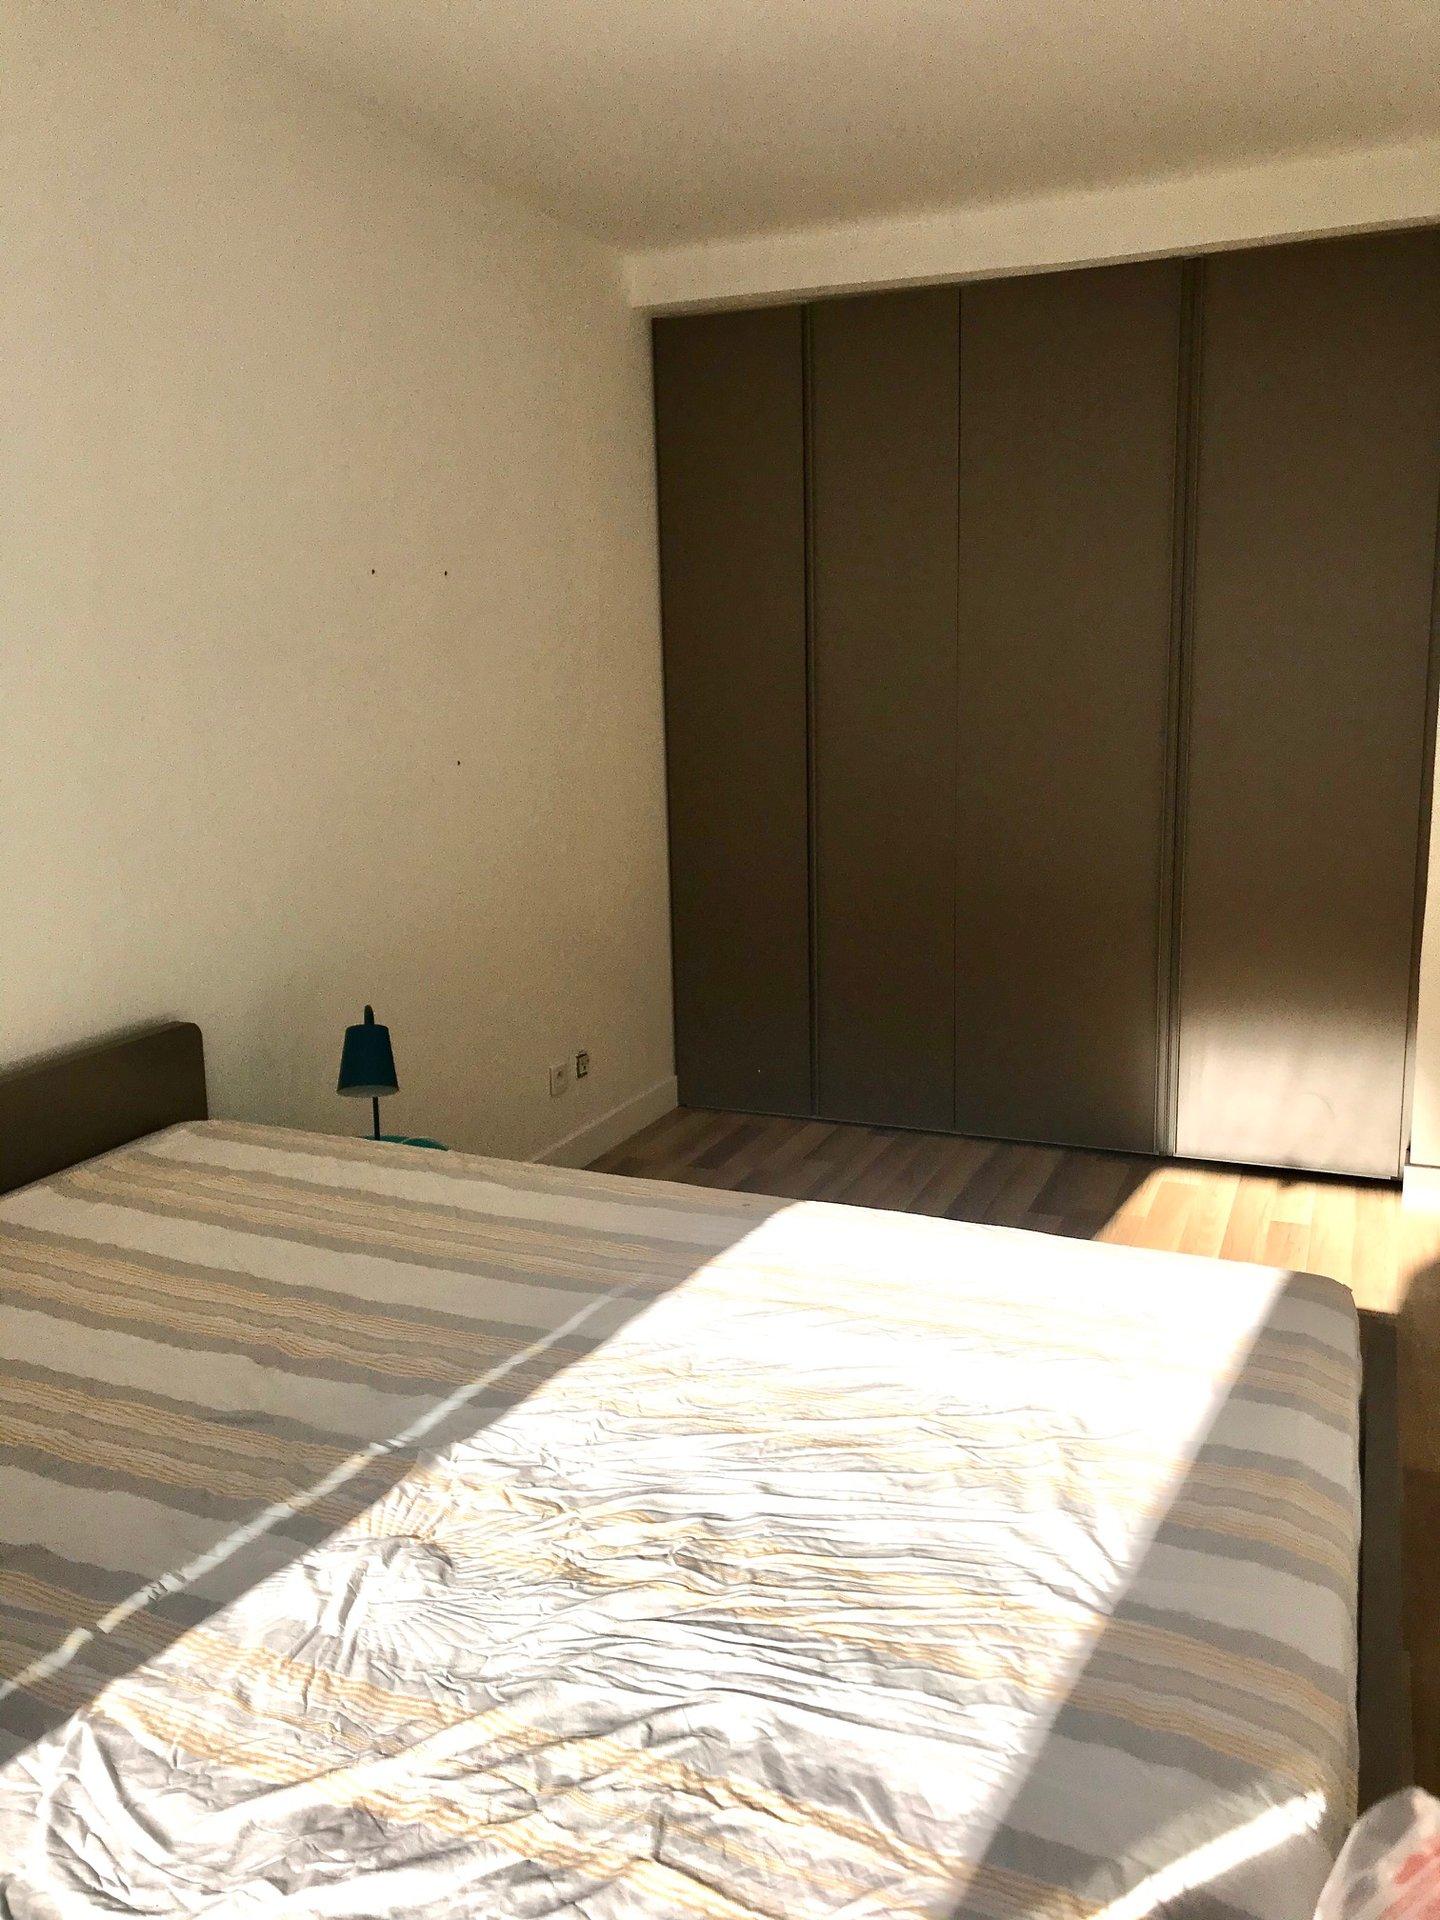 2 BEDROOMS APARTMENT SEAPORT GARIBALDI